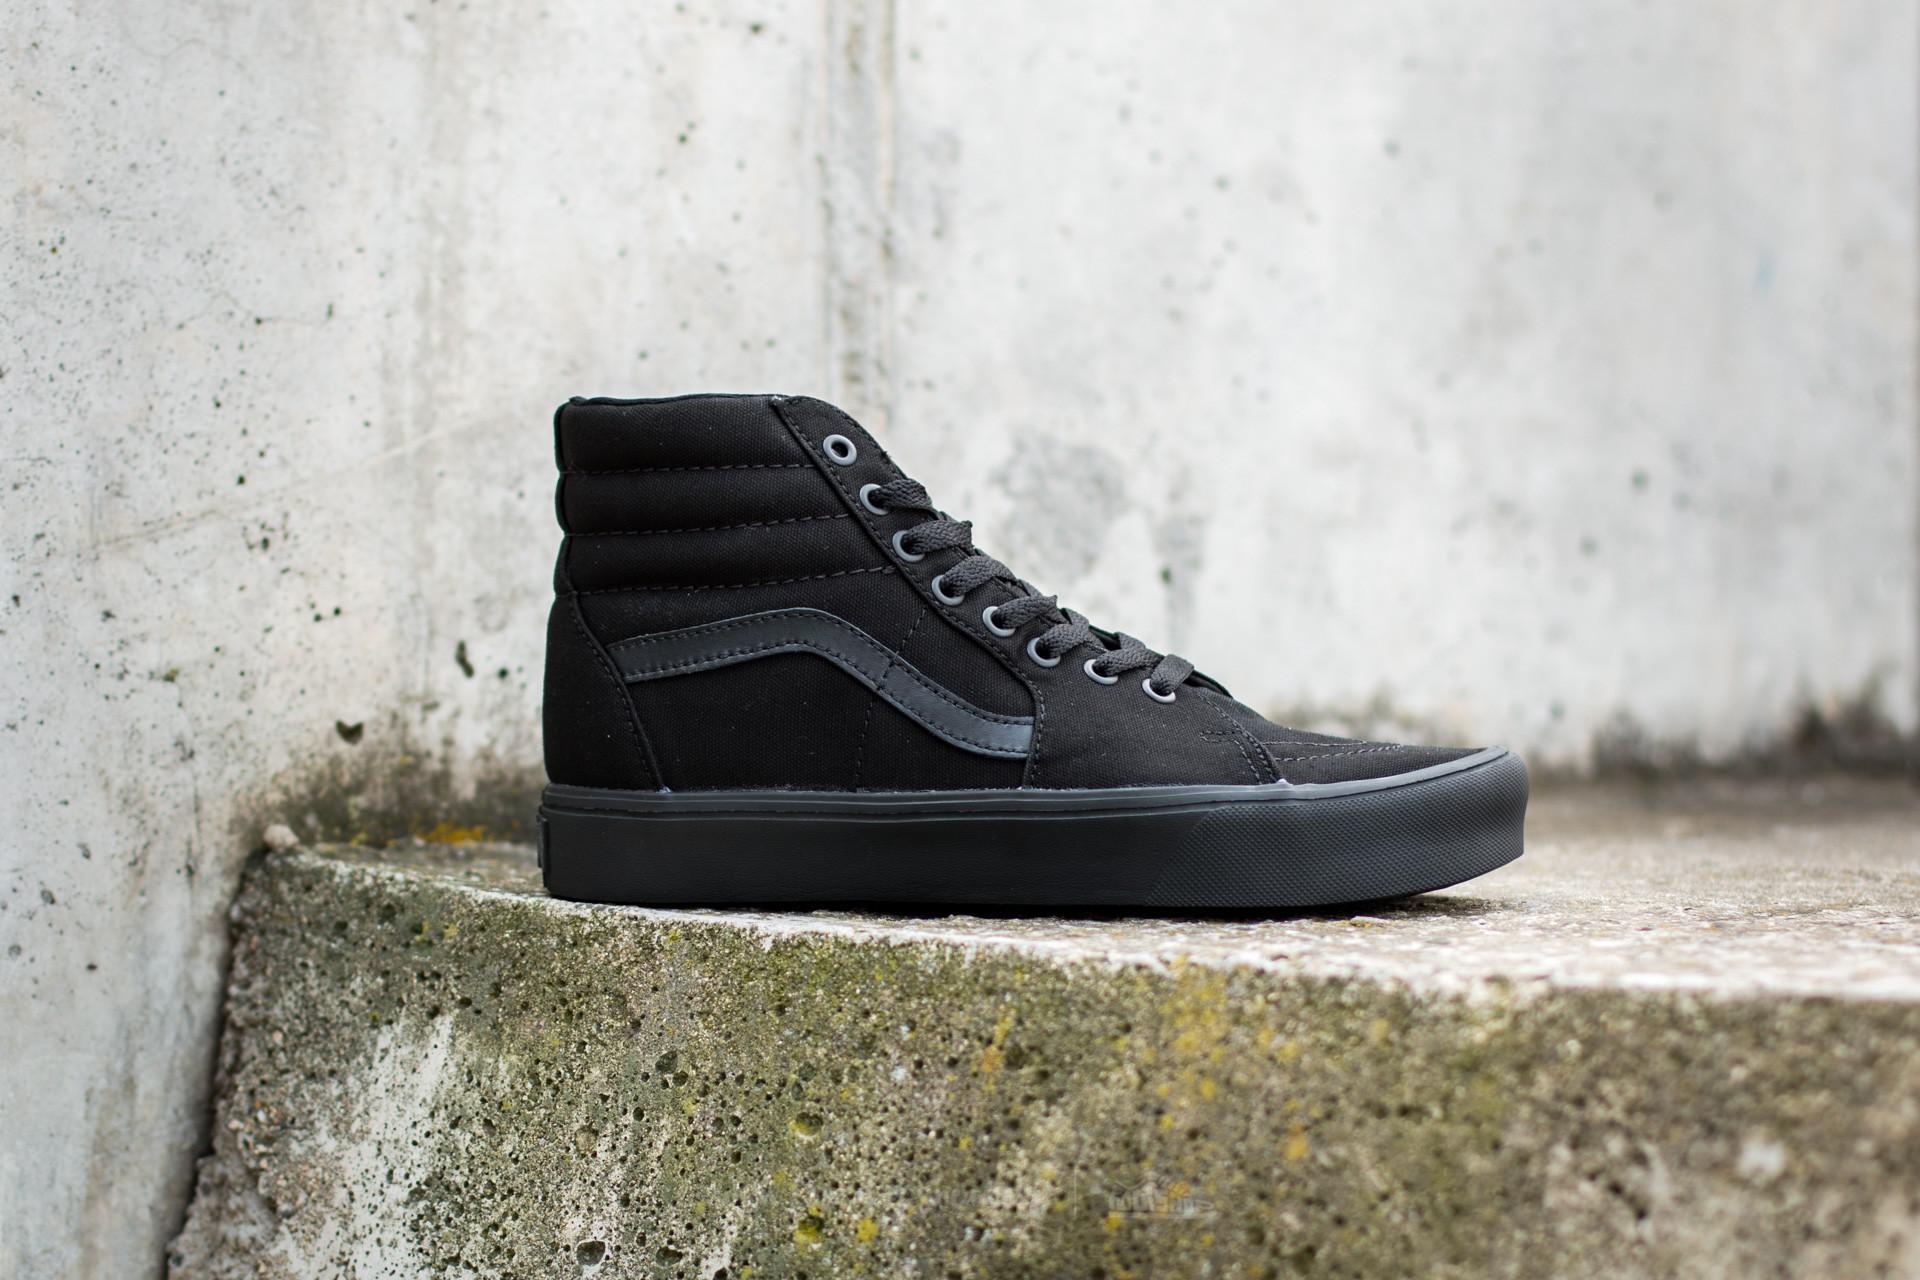 cbd0a71d1a9 Lyst - Vans Sk8-hi Lite (canvas) Black  Black in Black for Men